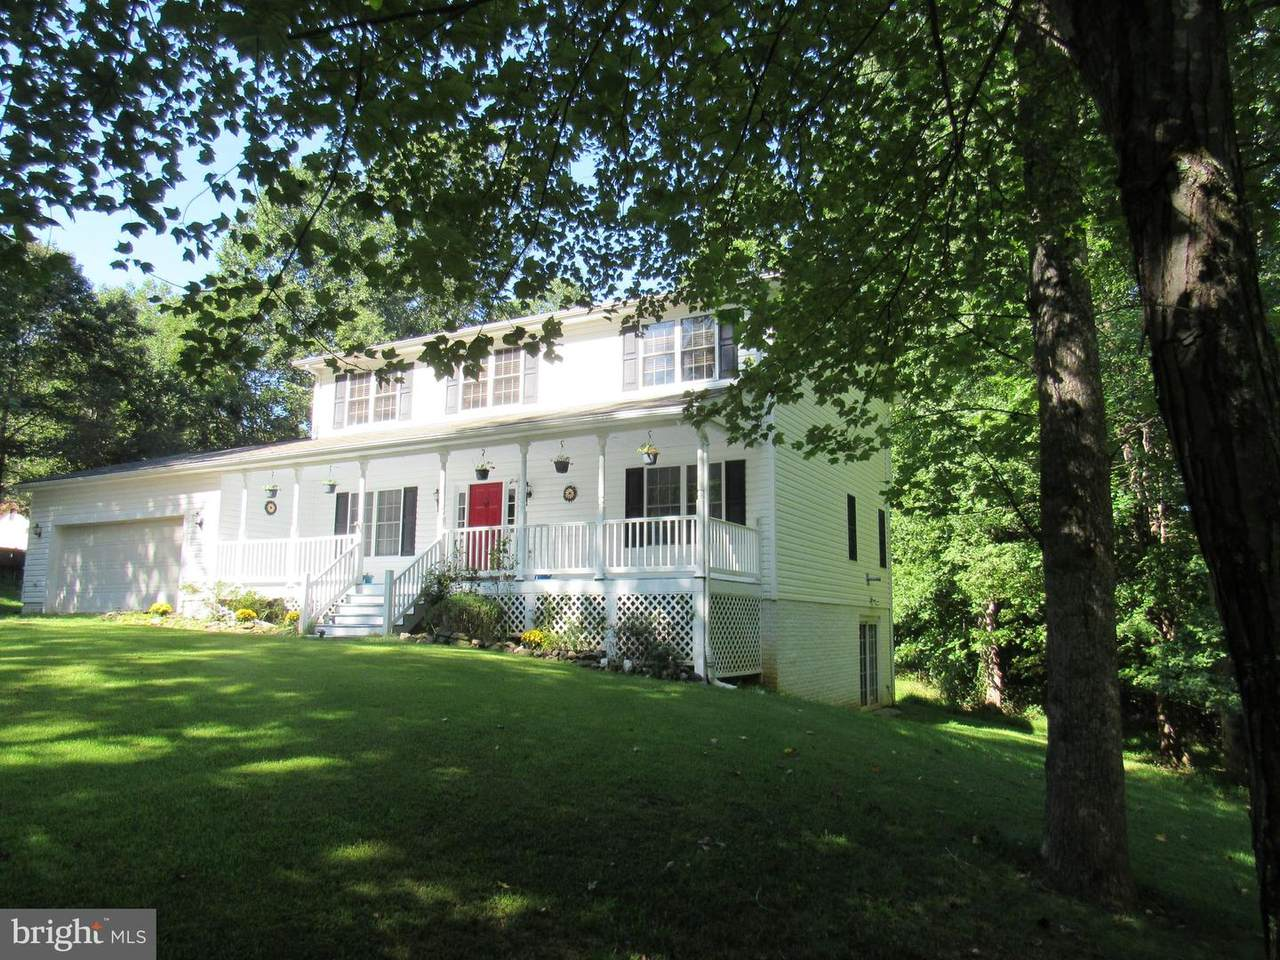 8658 Old Stillhouse Road - Photo 1